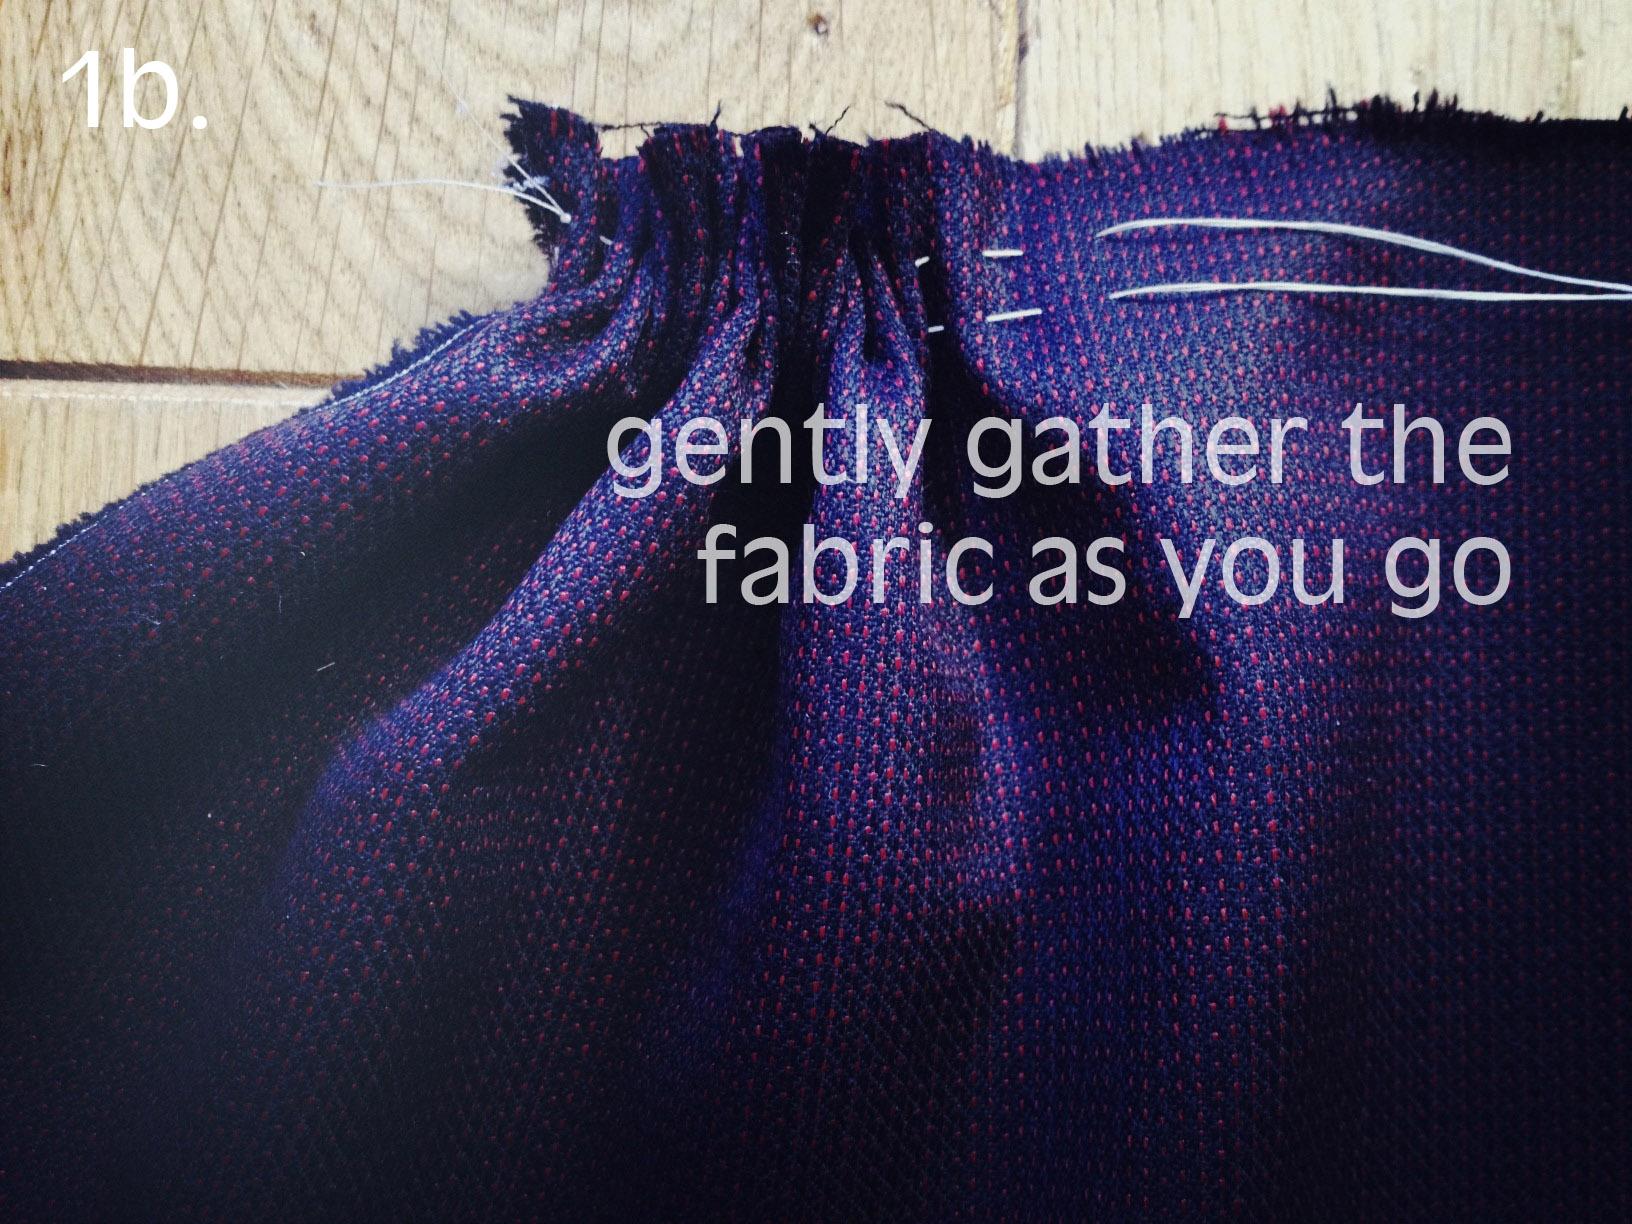 Nerdy Sewing Tips 3 Ways To Gather By Hand London Vintage Machine Threading Guides Stitch Nerd 2